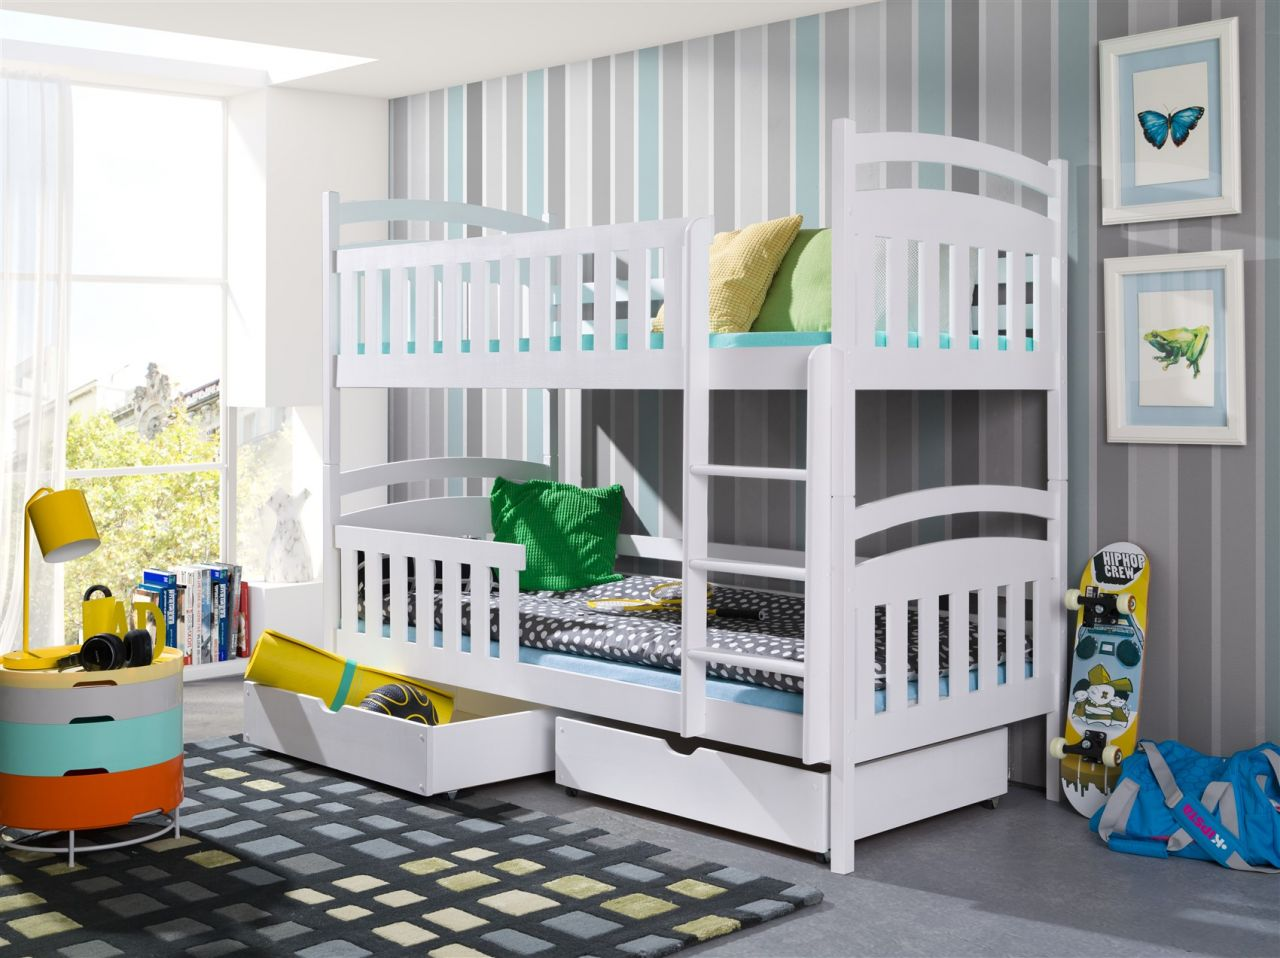 Etagenbett Liegefläche 80 180 : Flexa betten etagenbett kinderbett plattformbett und